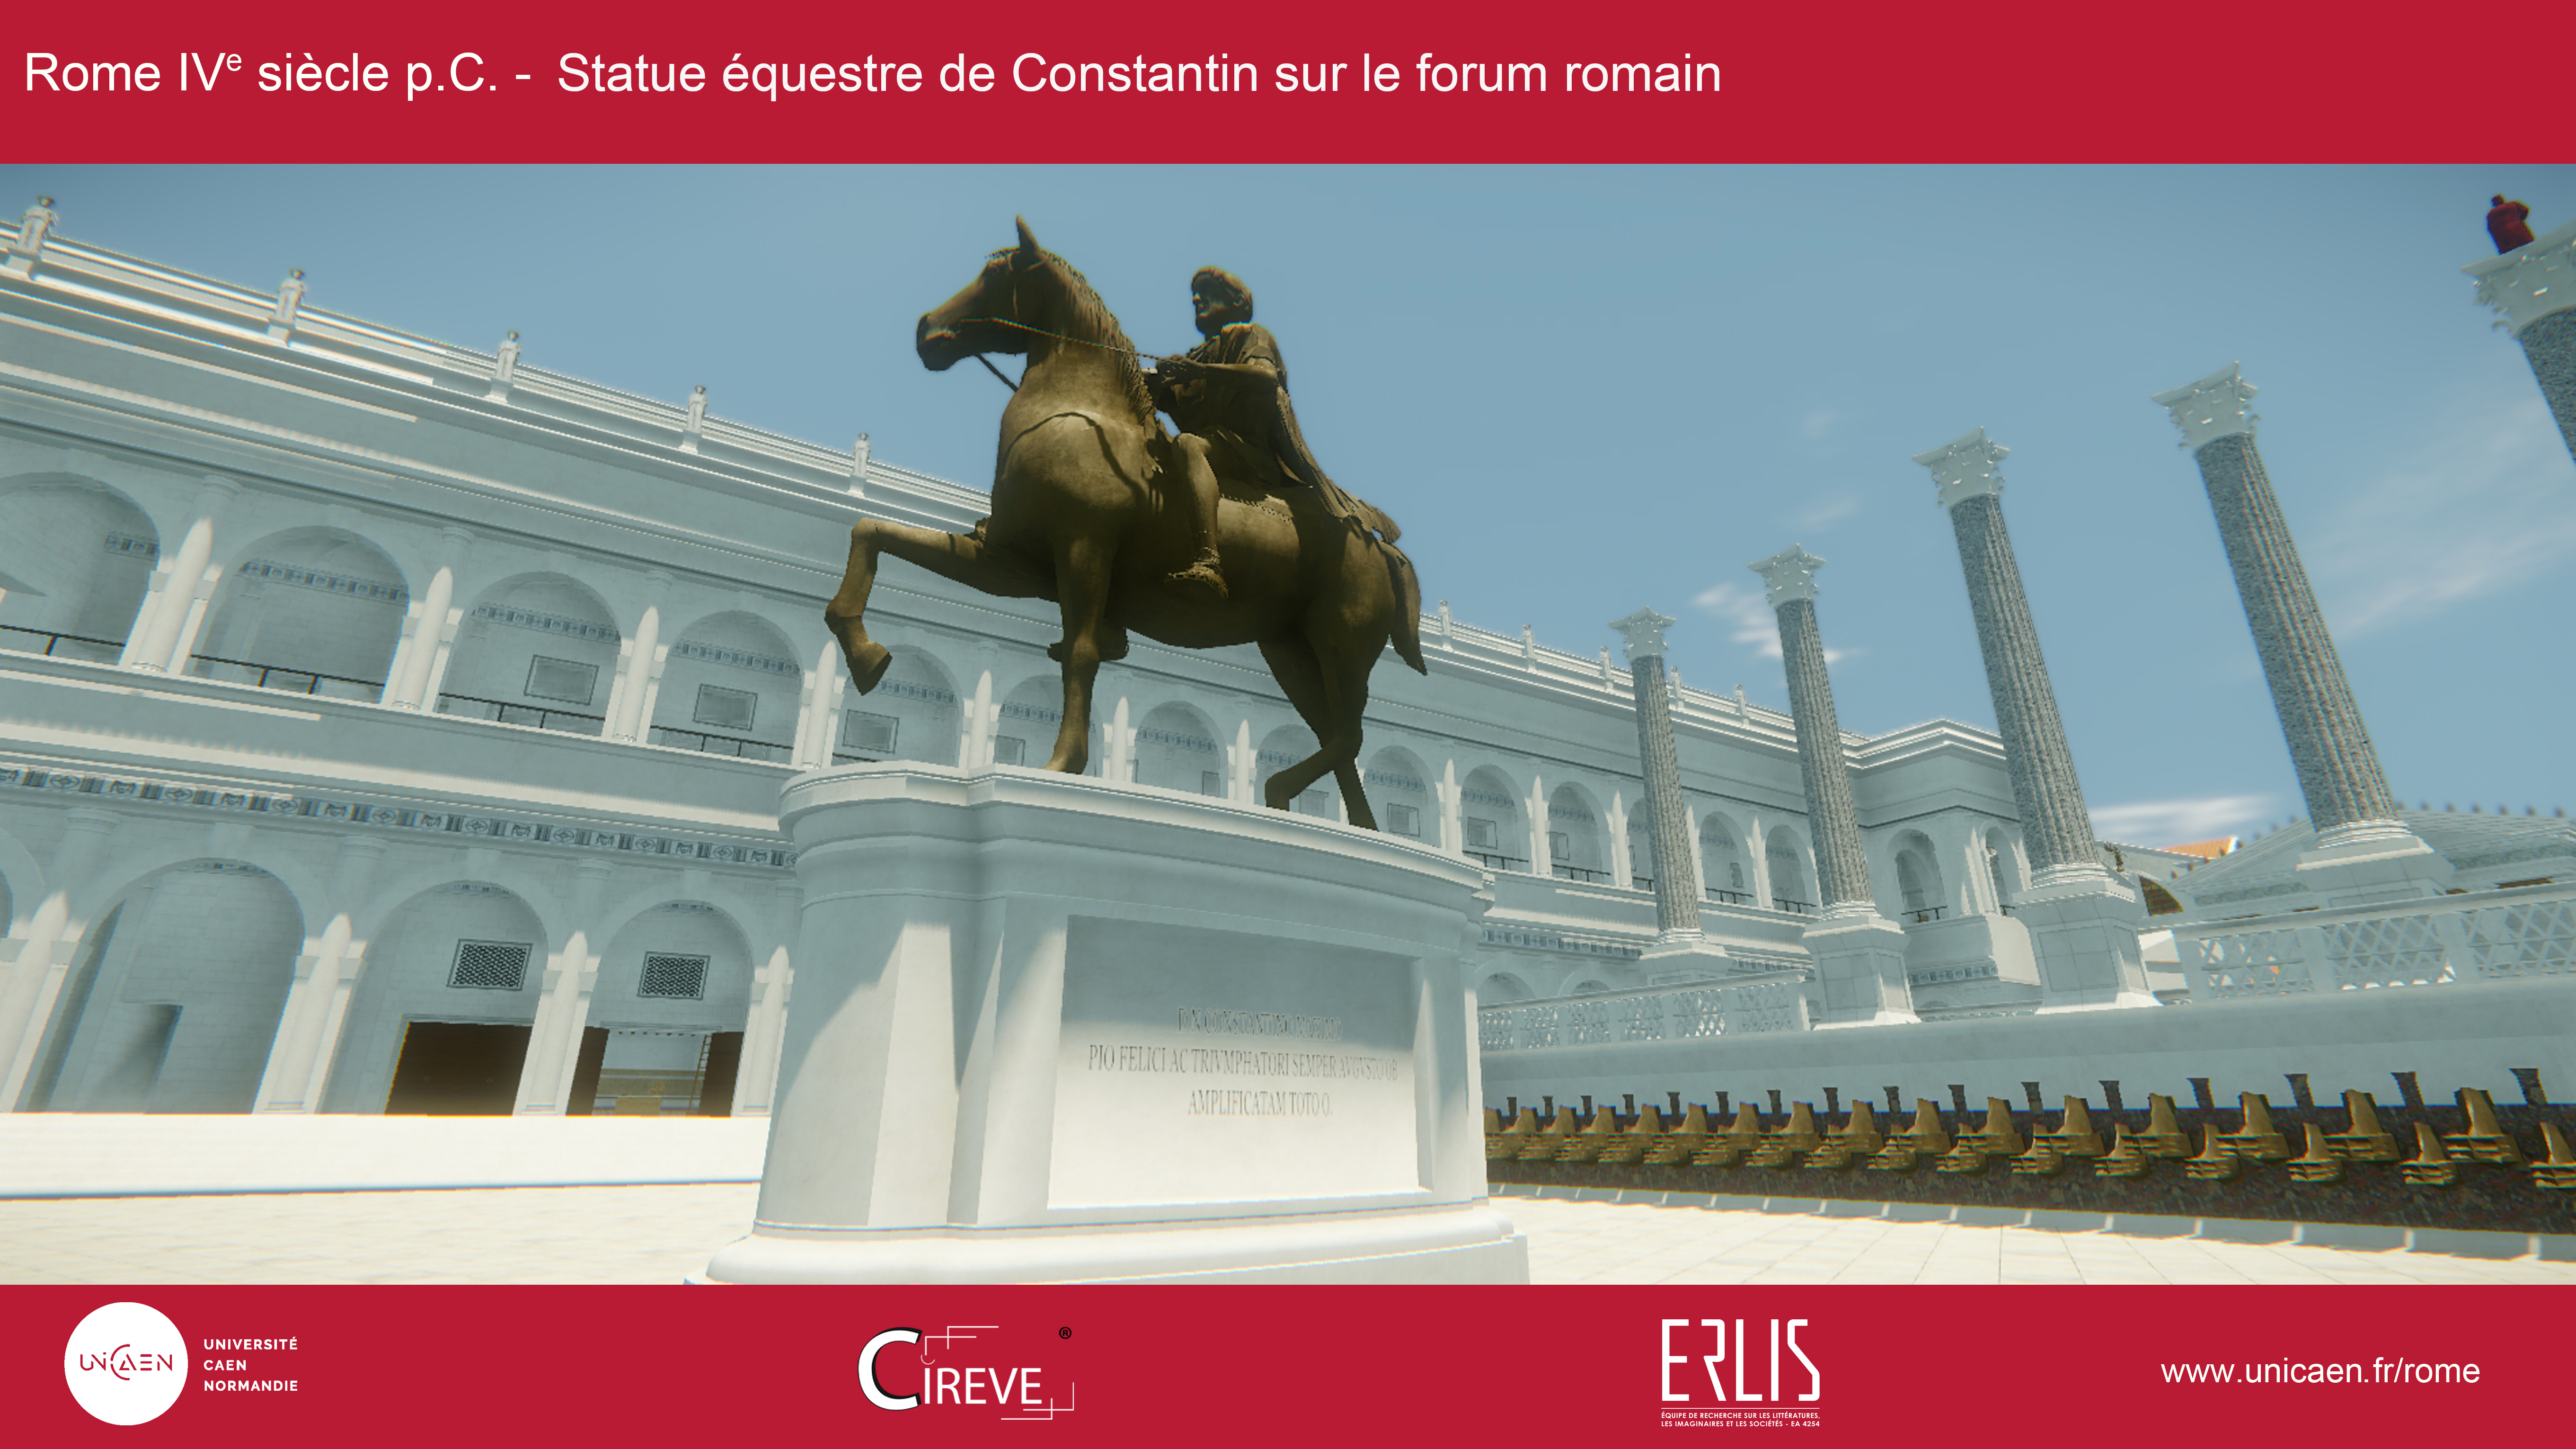 Statue équestre de Constantin